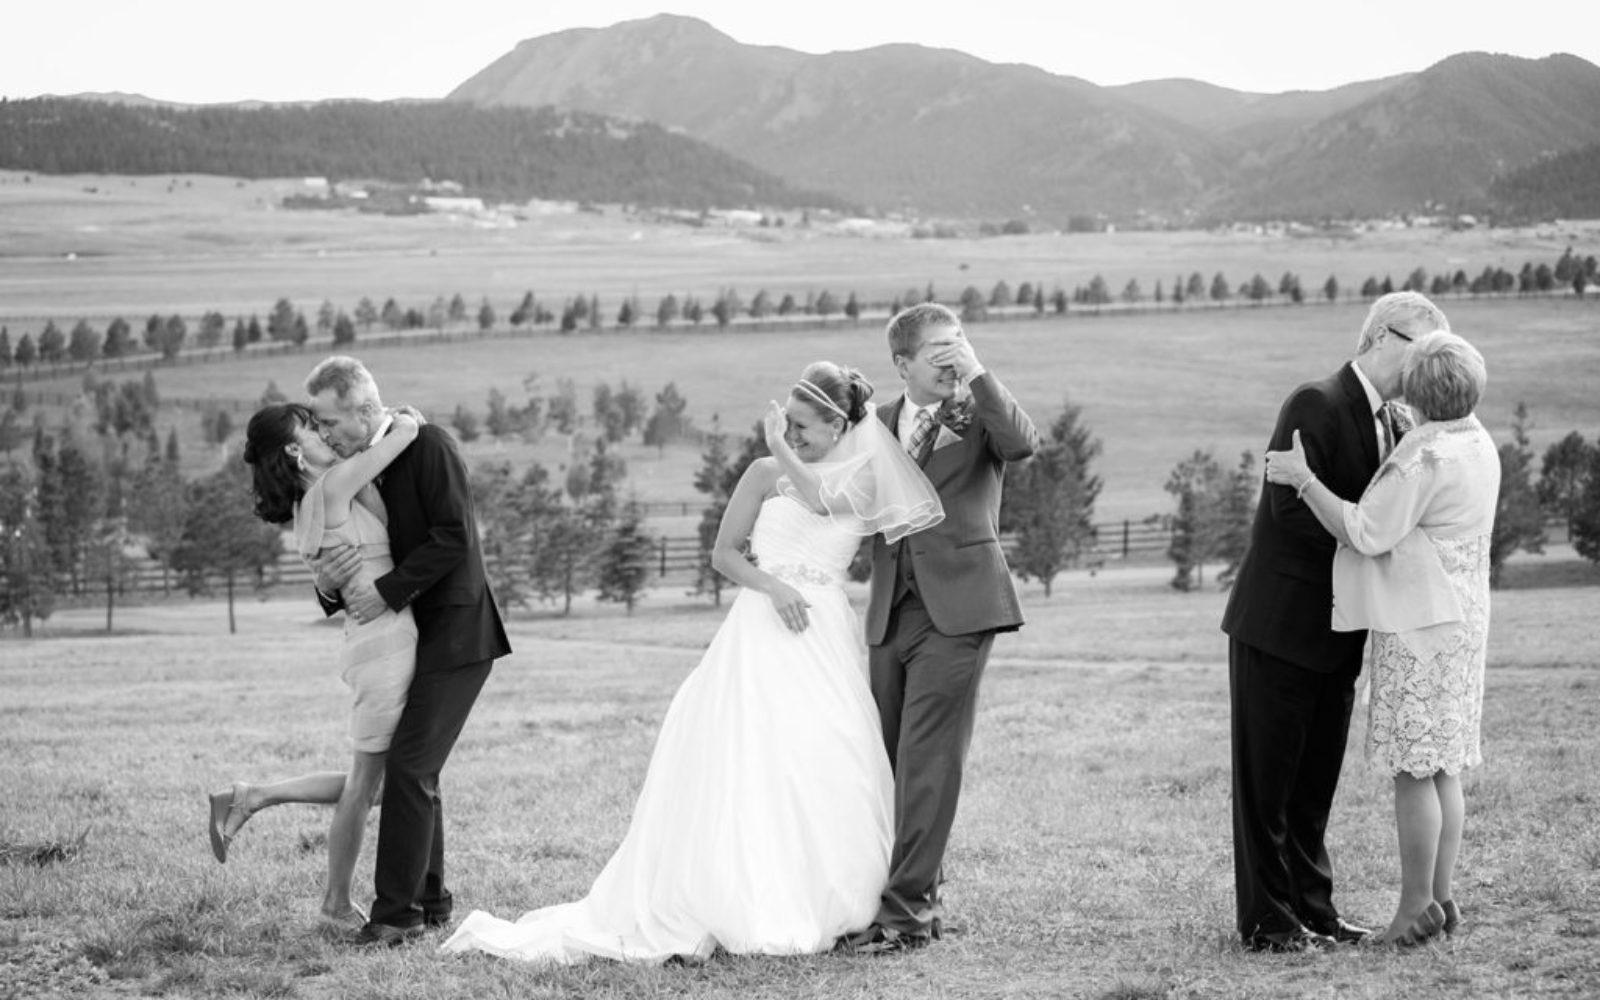 weddingphotographycoloradosprings_46-1024x640